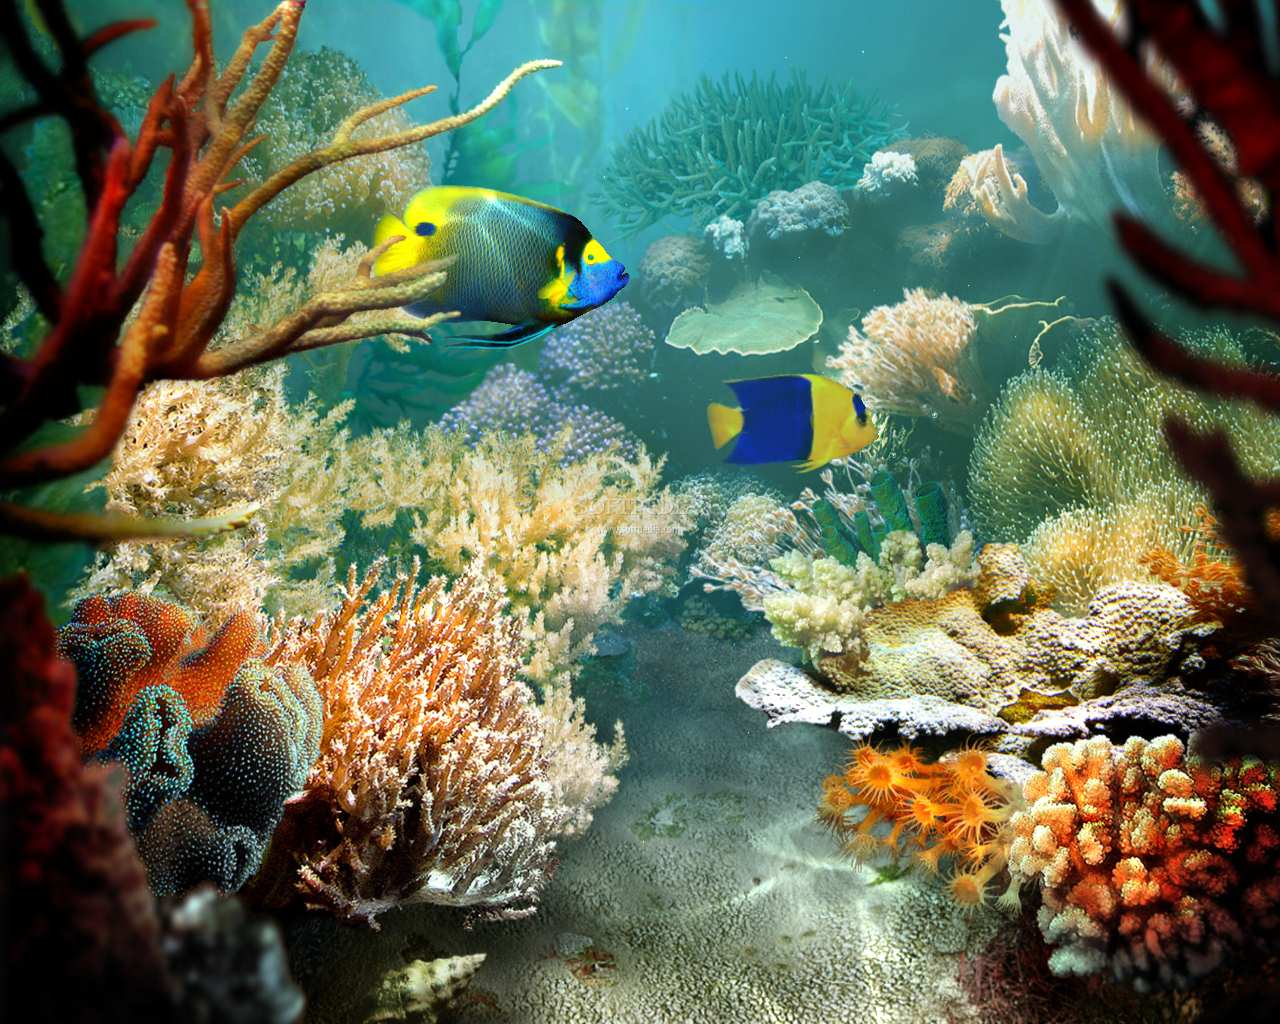 http://www.softpedia.com/screenshots/Tropical-Fish-3D-Photo-Screensaver_1.jpg